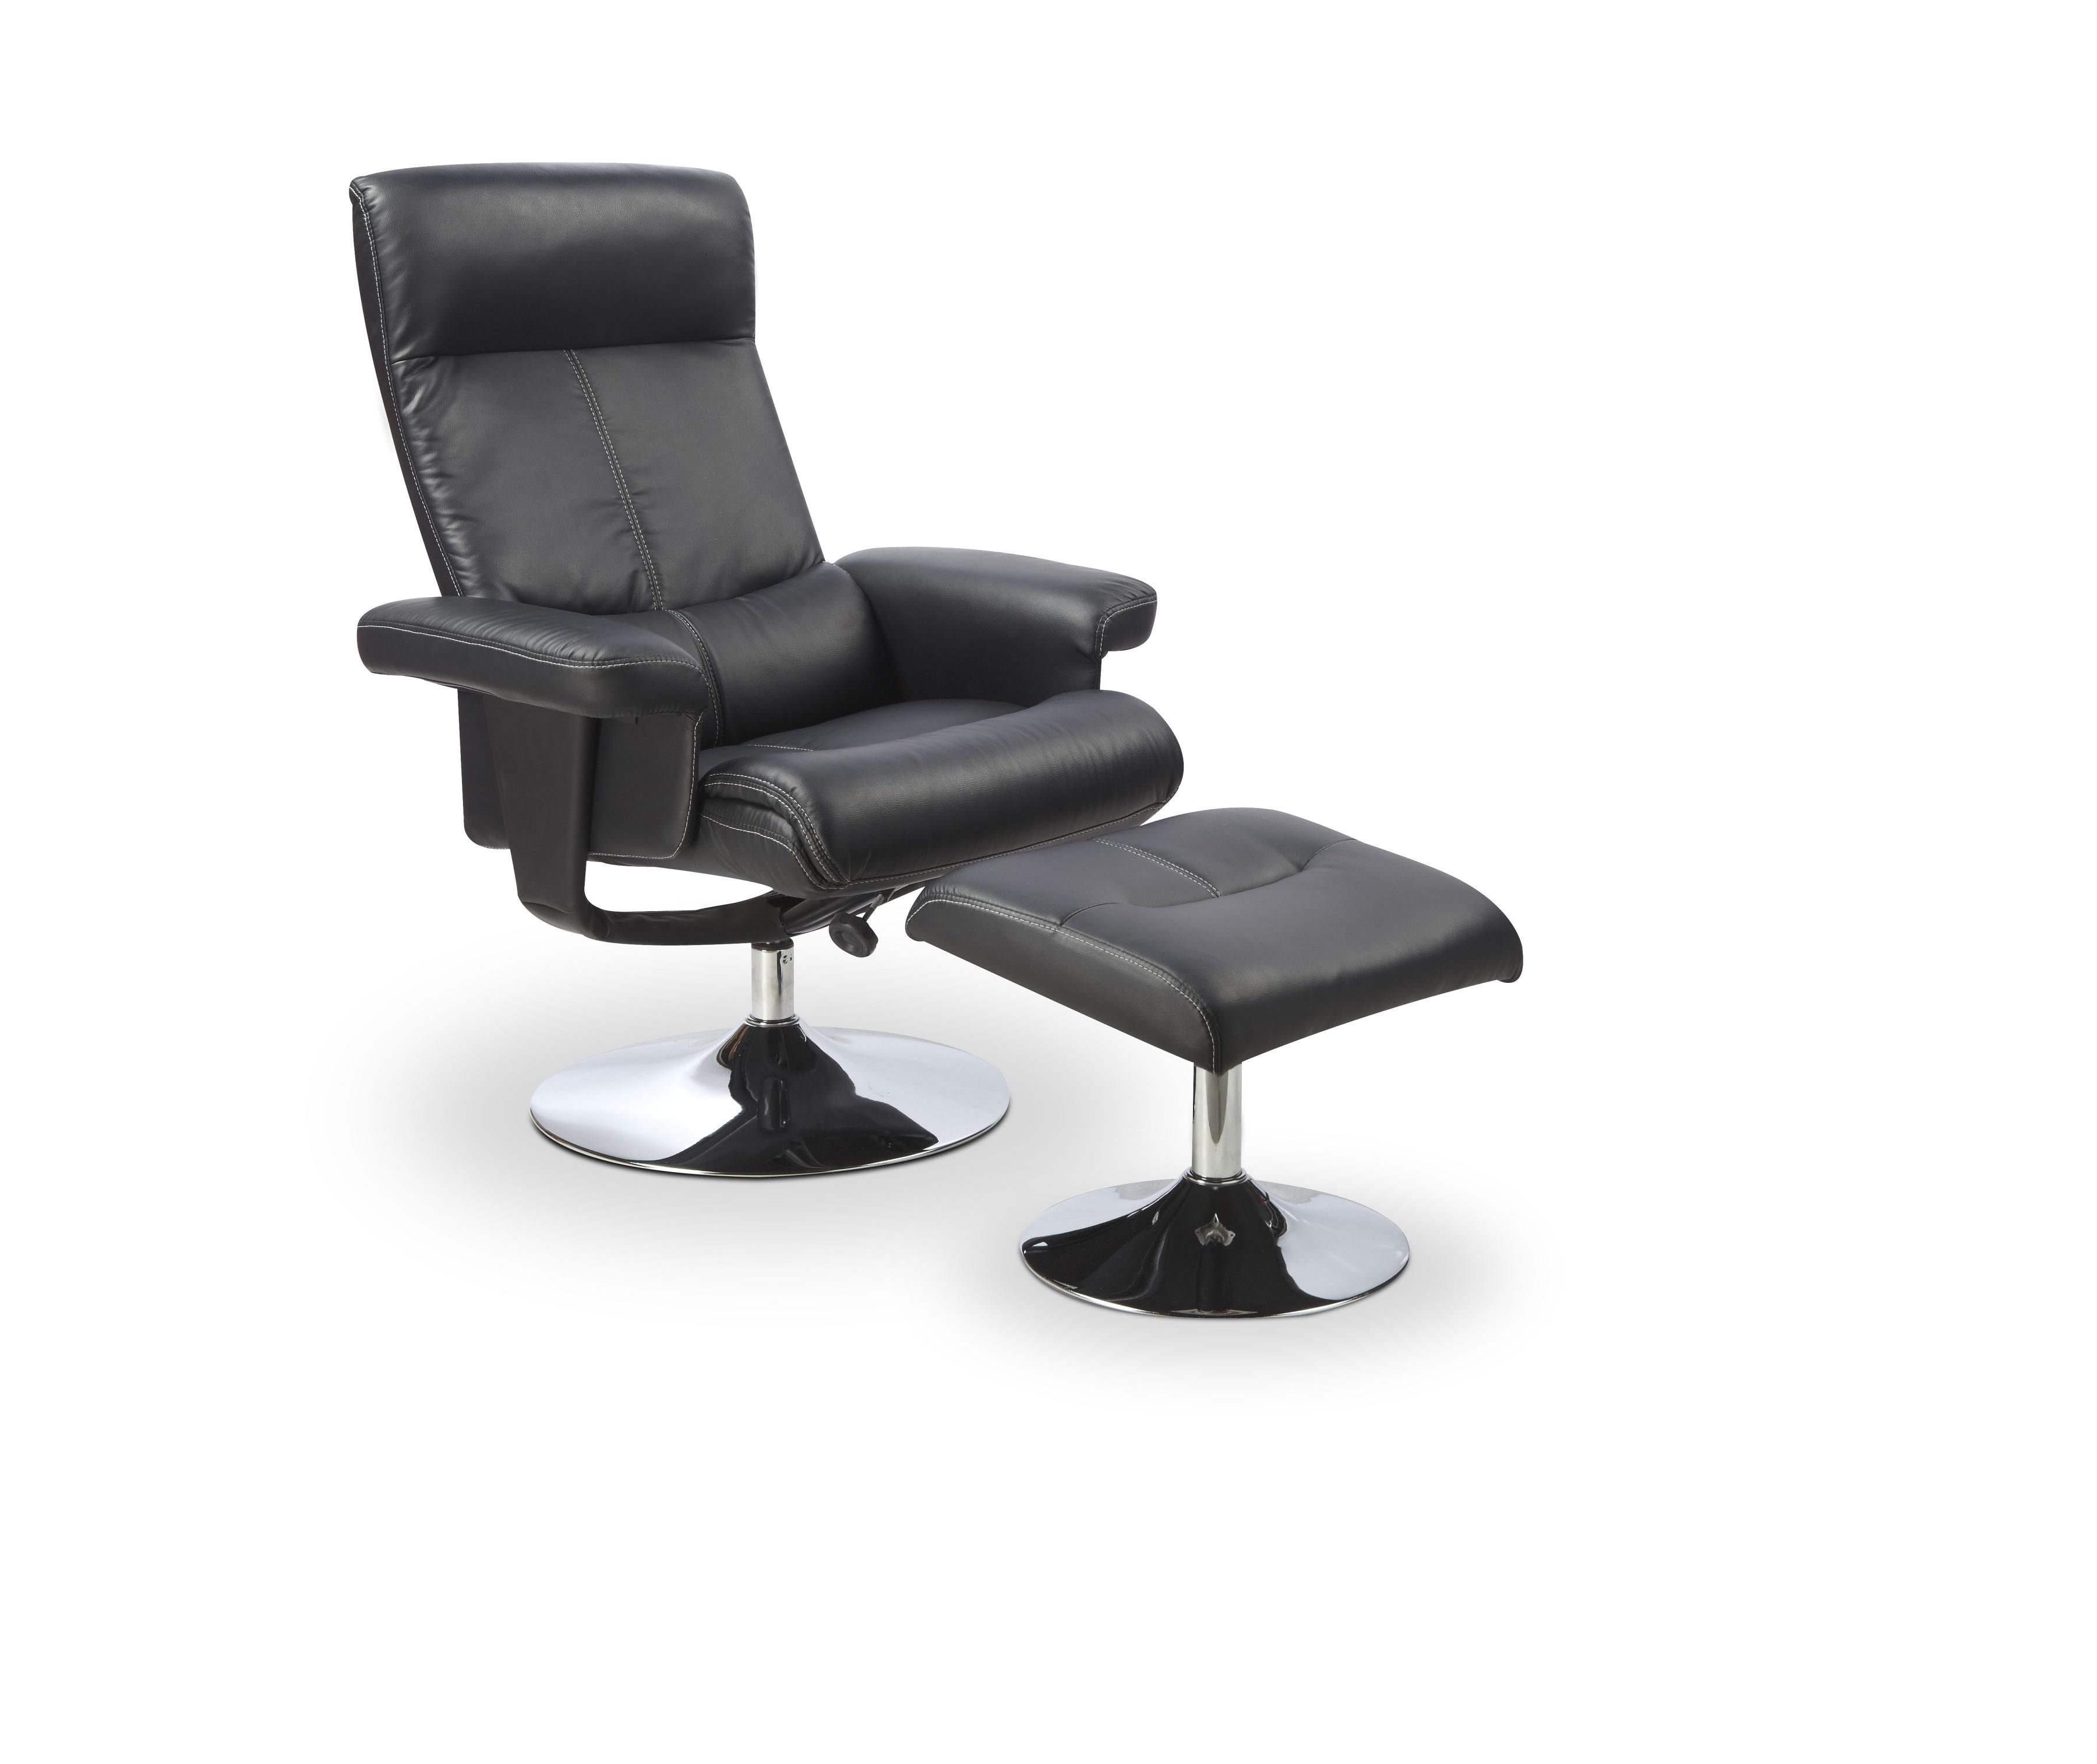 Relaxační křeslo - Halmar - DAYTON